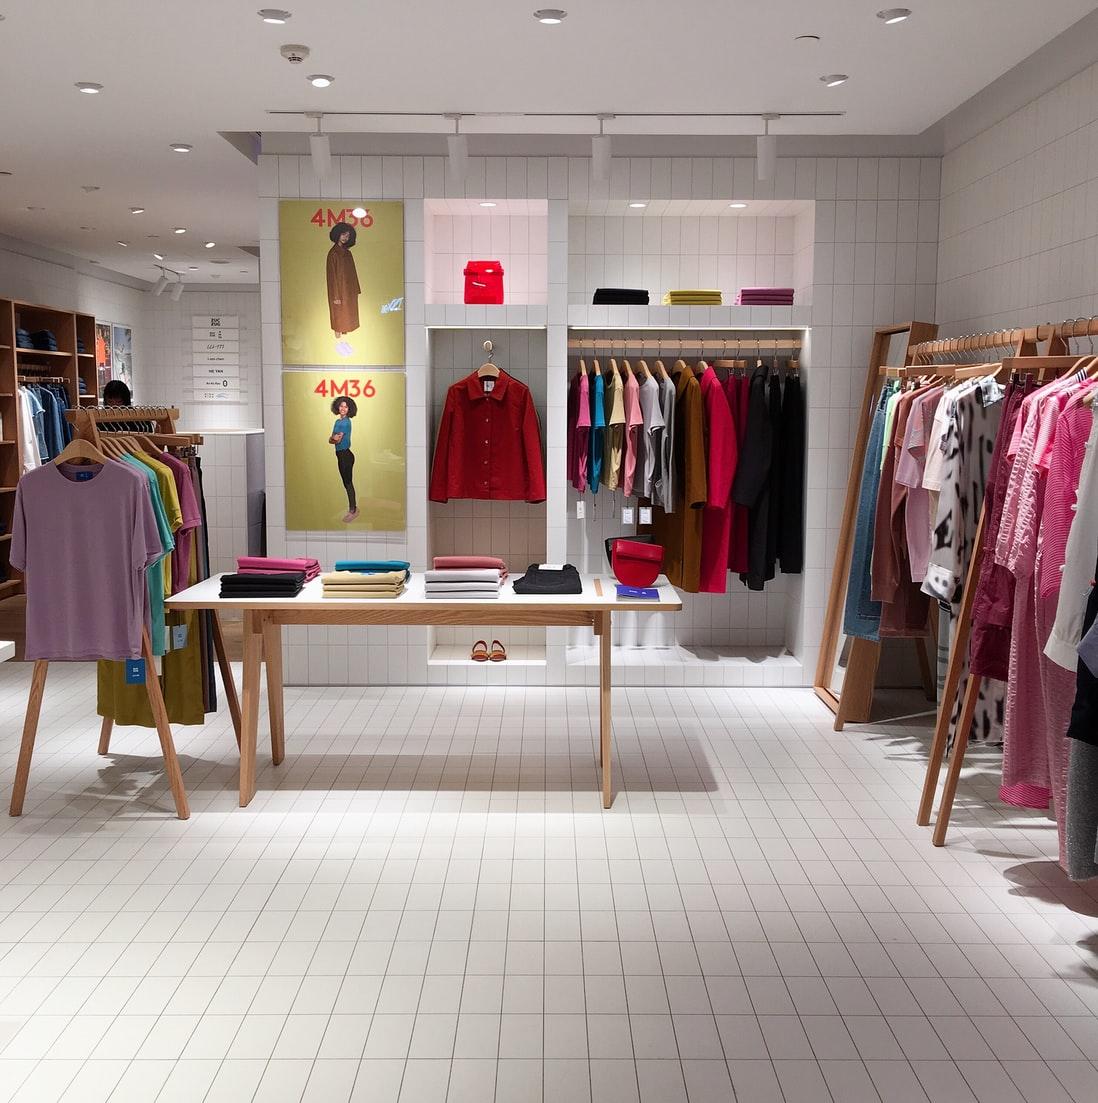 Seasonless Landscape – How Will Merchandising Change?